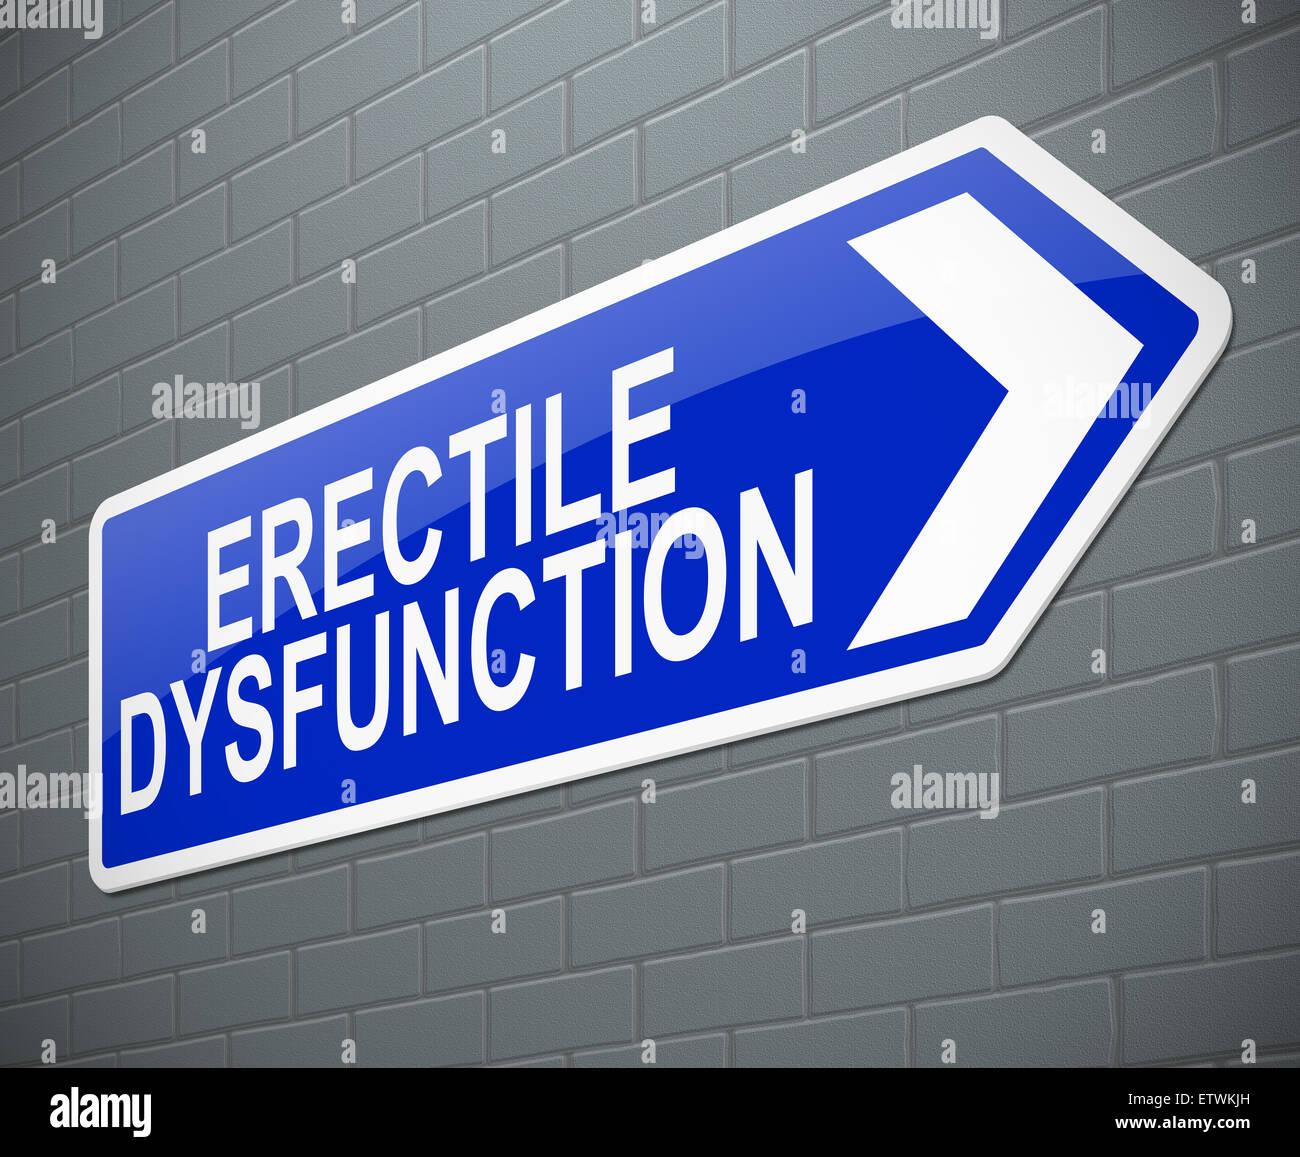 Erectile dysfunction concept. - Stock Image